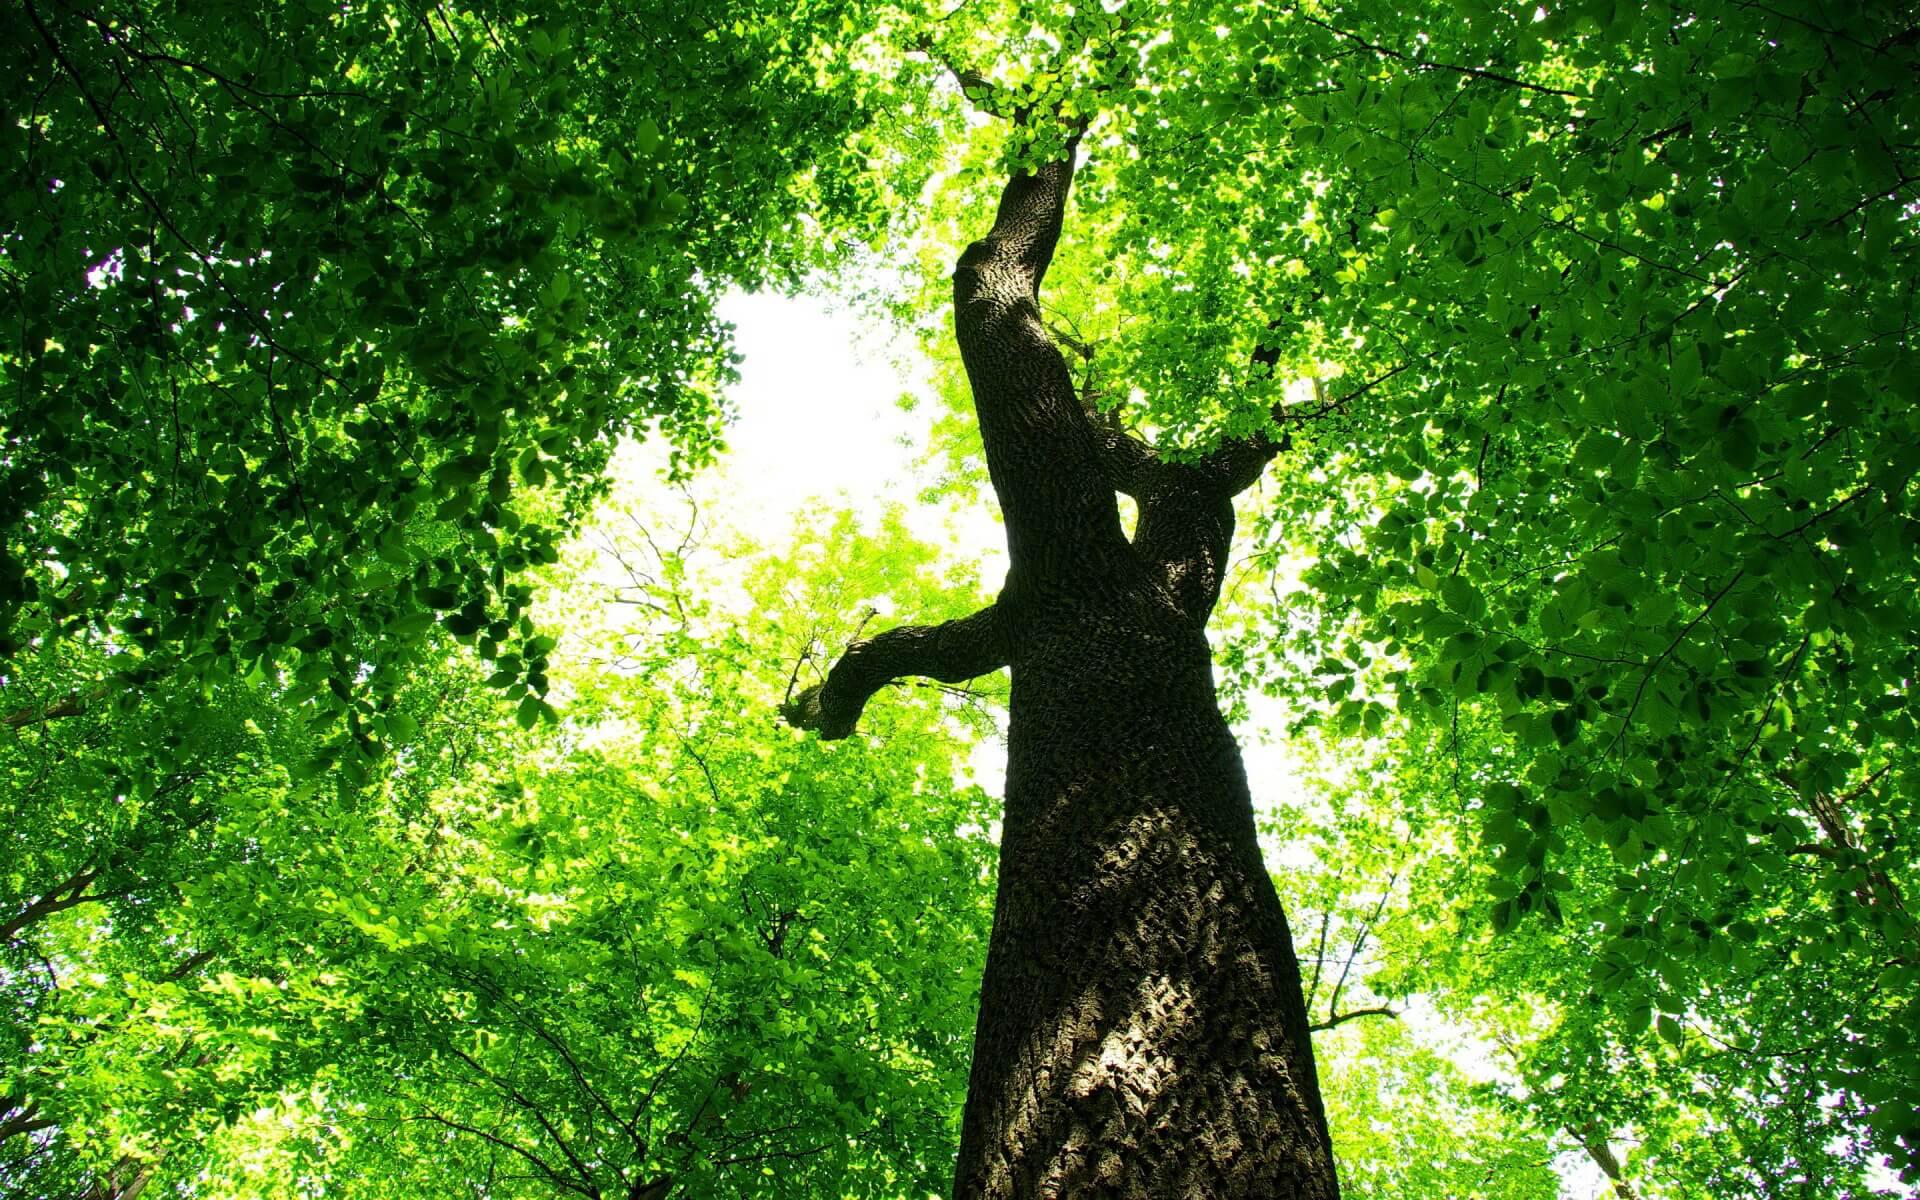 6981882-summer-green-tree-foliage